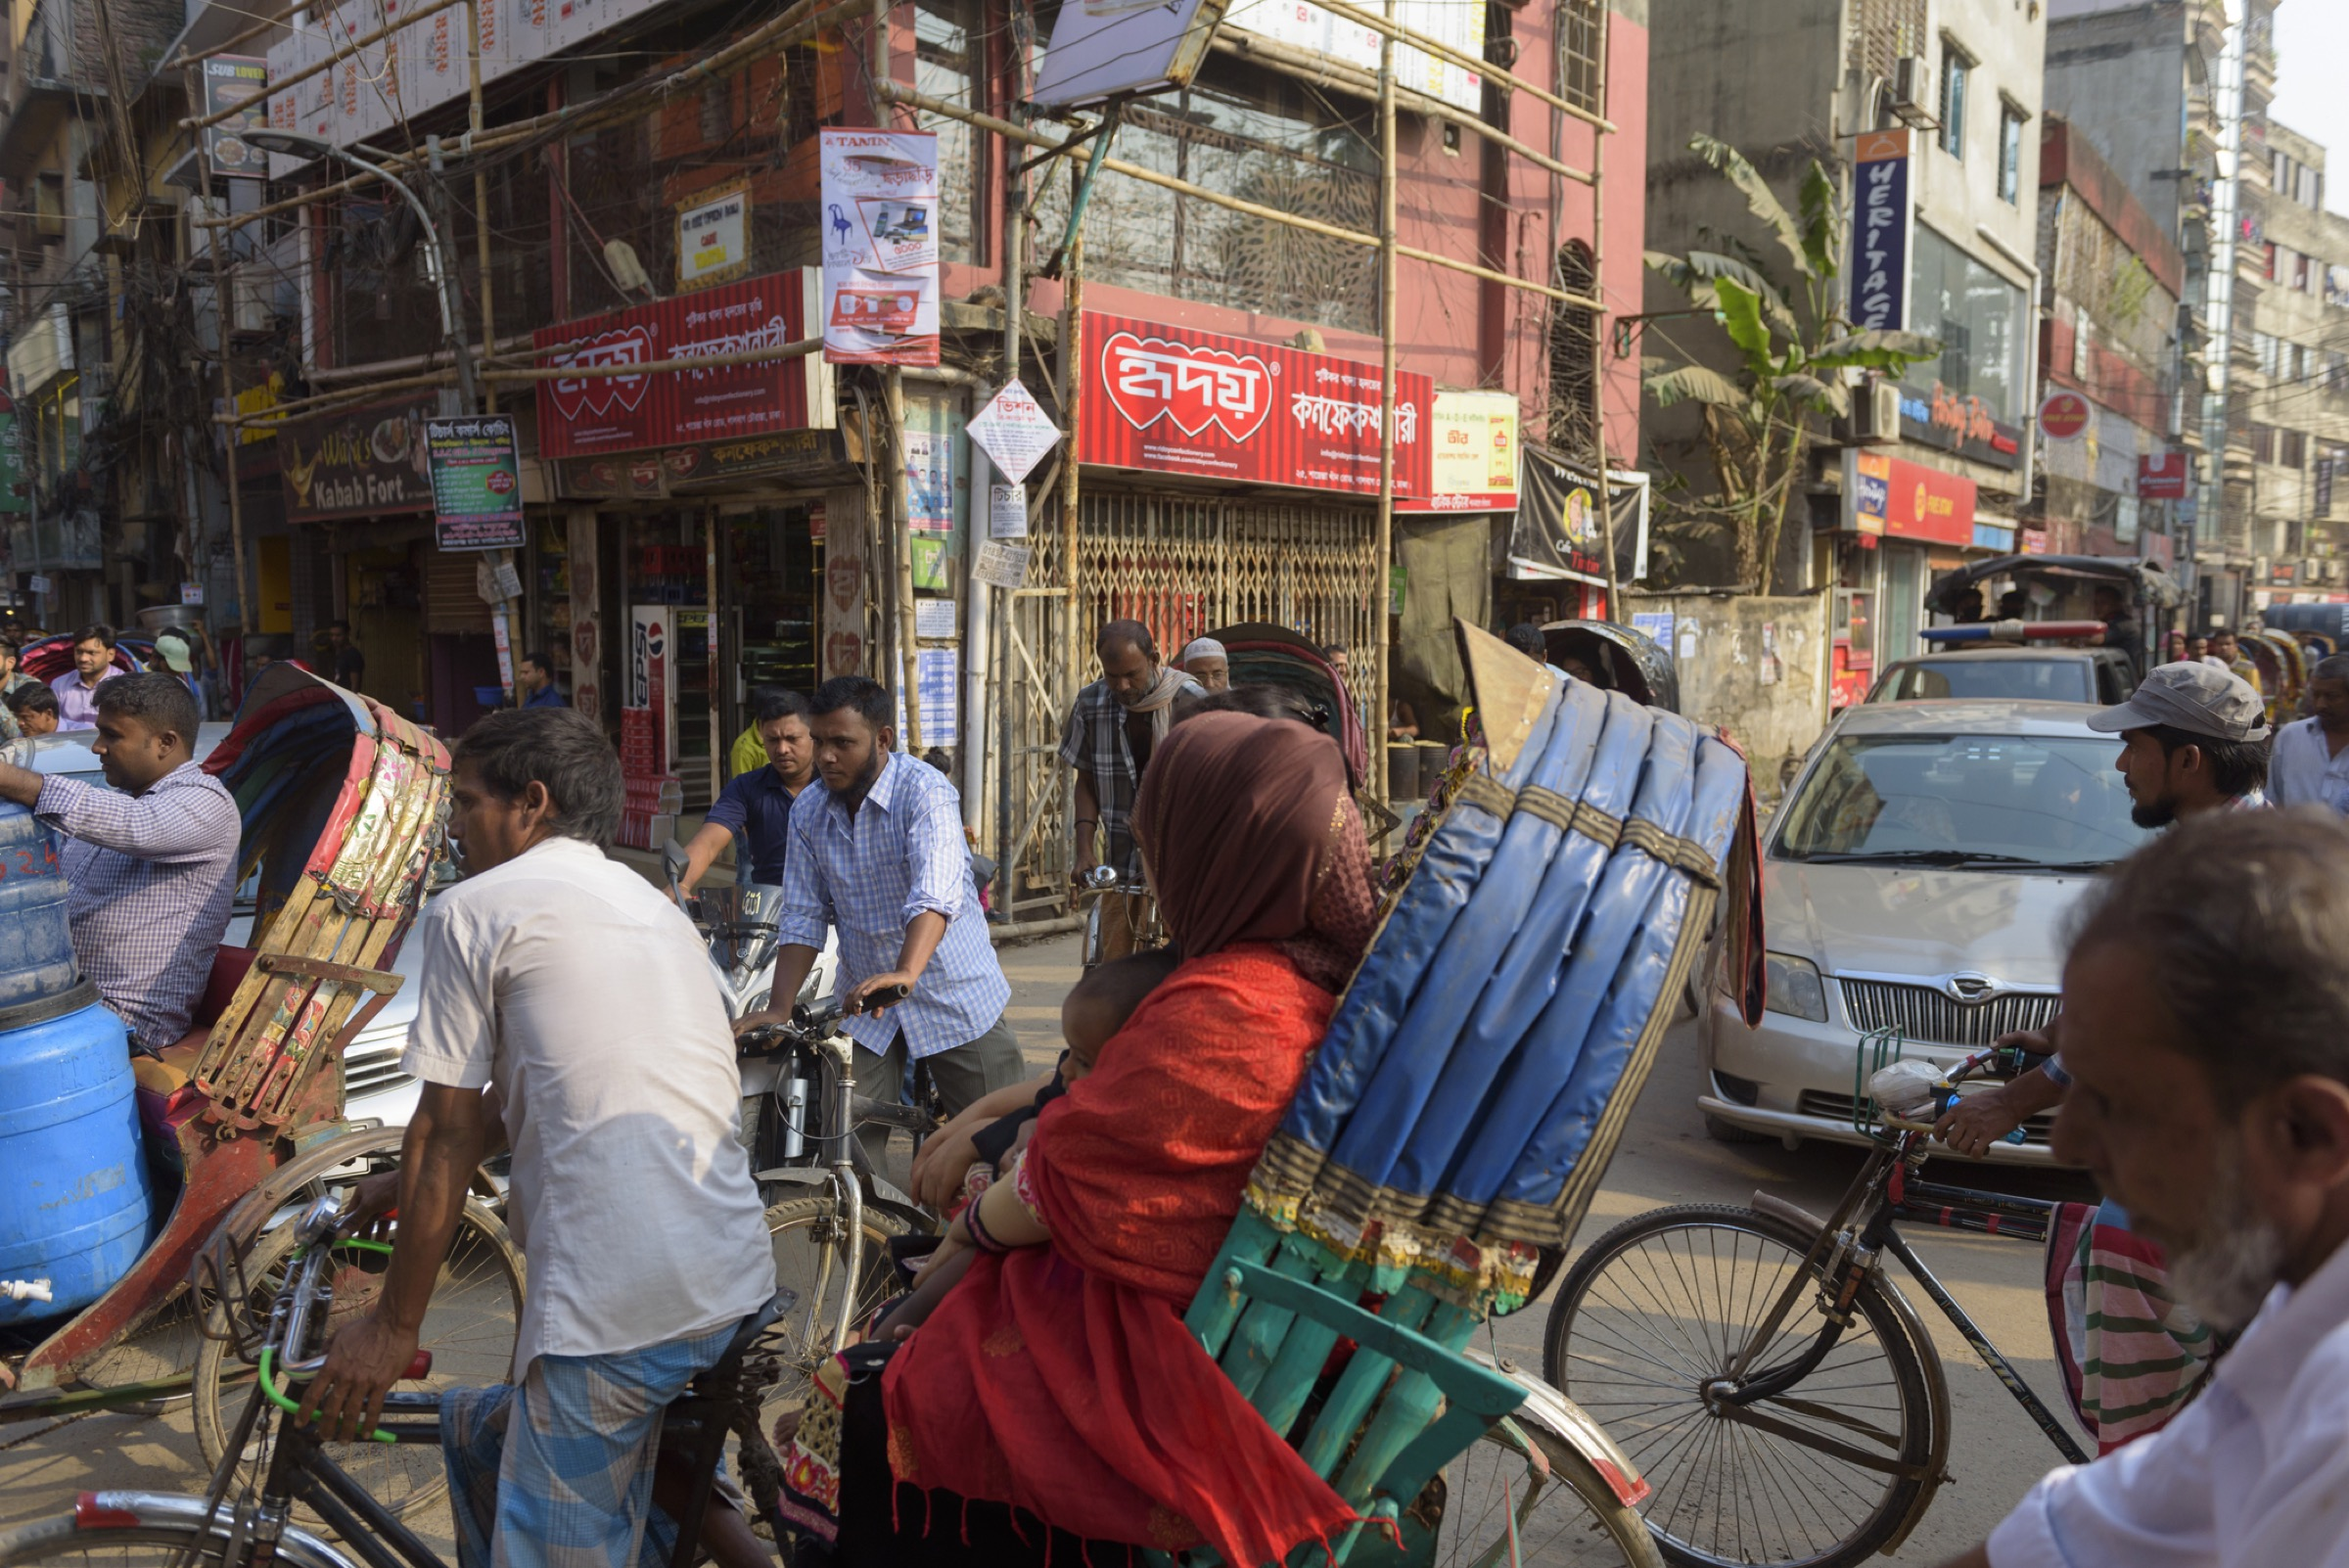 Heavy traffic in crowded streets of Dhaka, Bangladesh